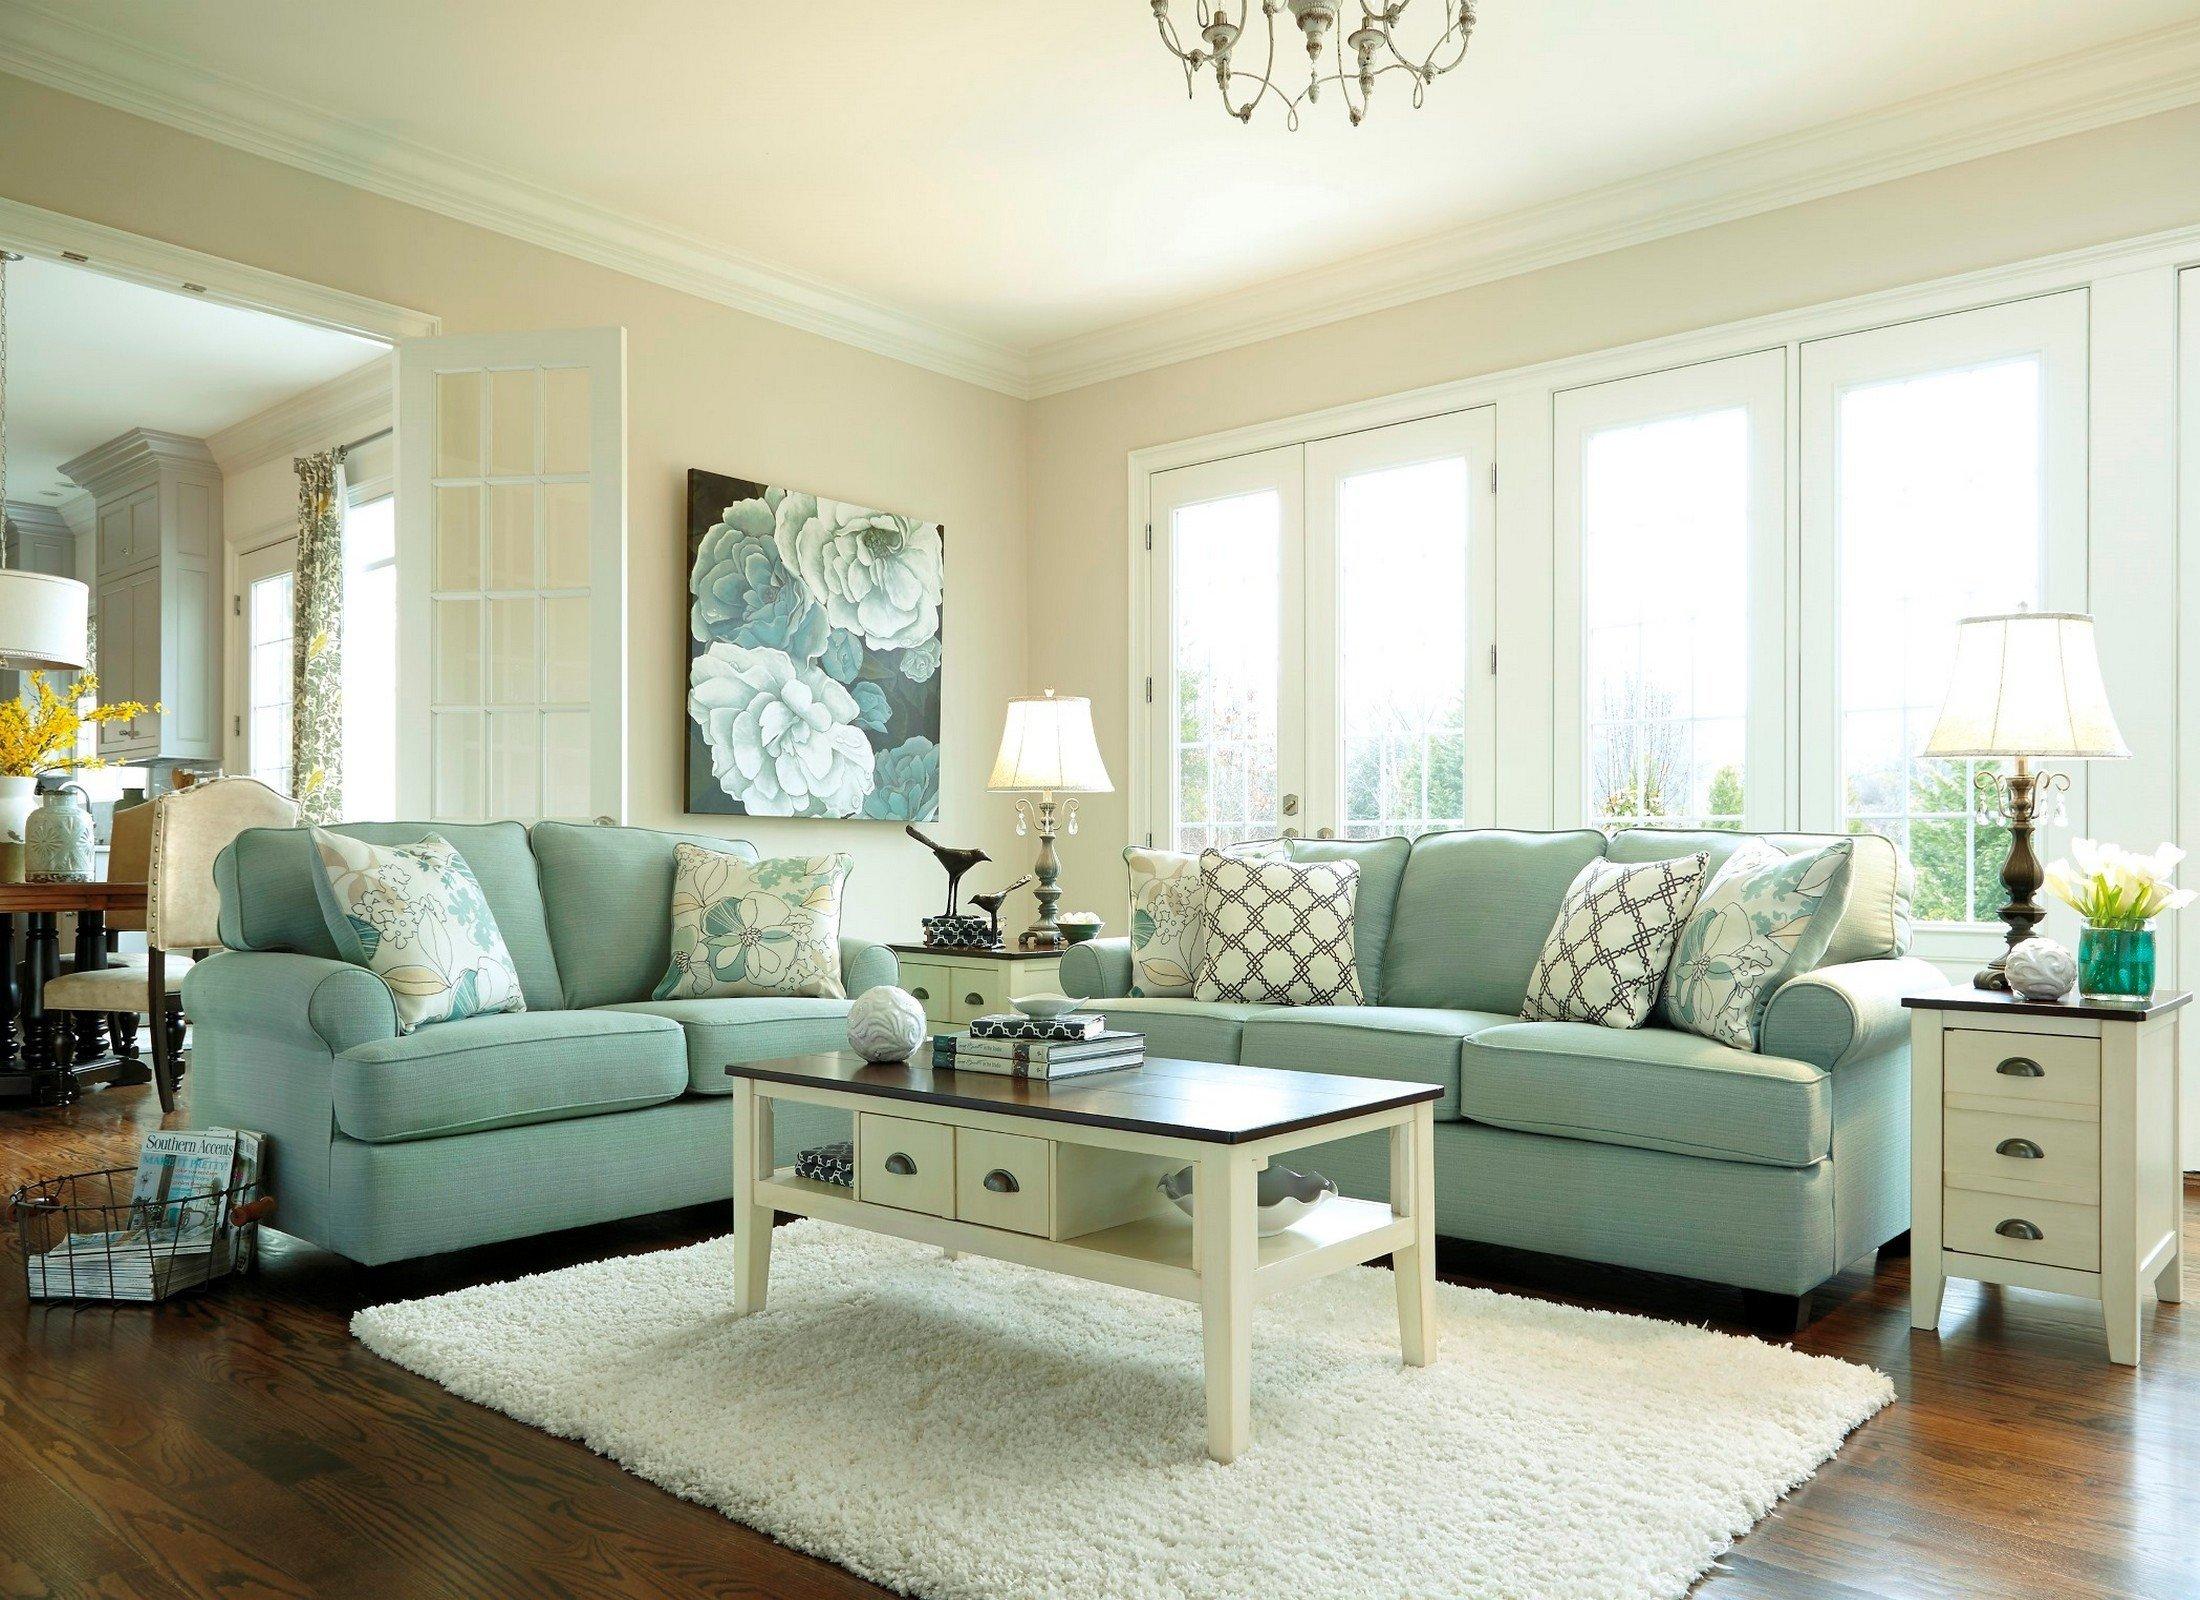 Living Room Furniture Ideas Luxury Daystar Living Room Set From ashley 38 35